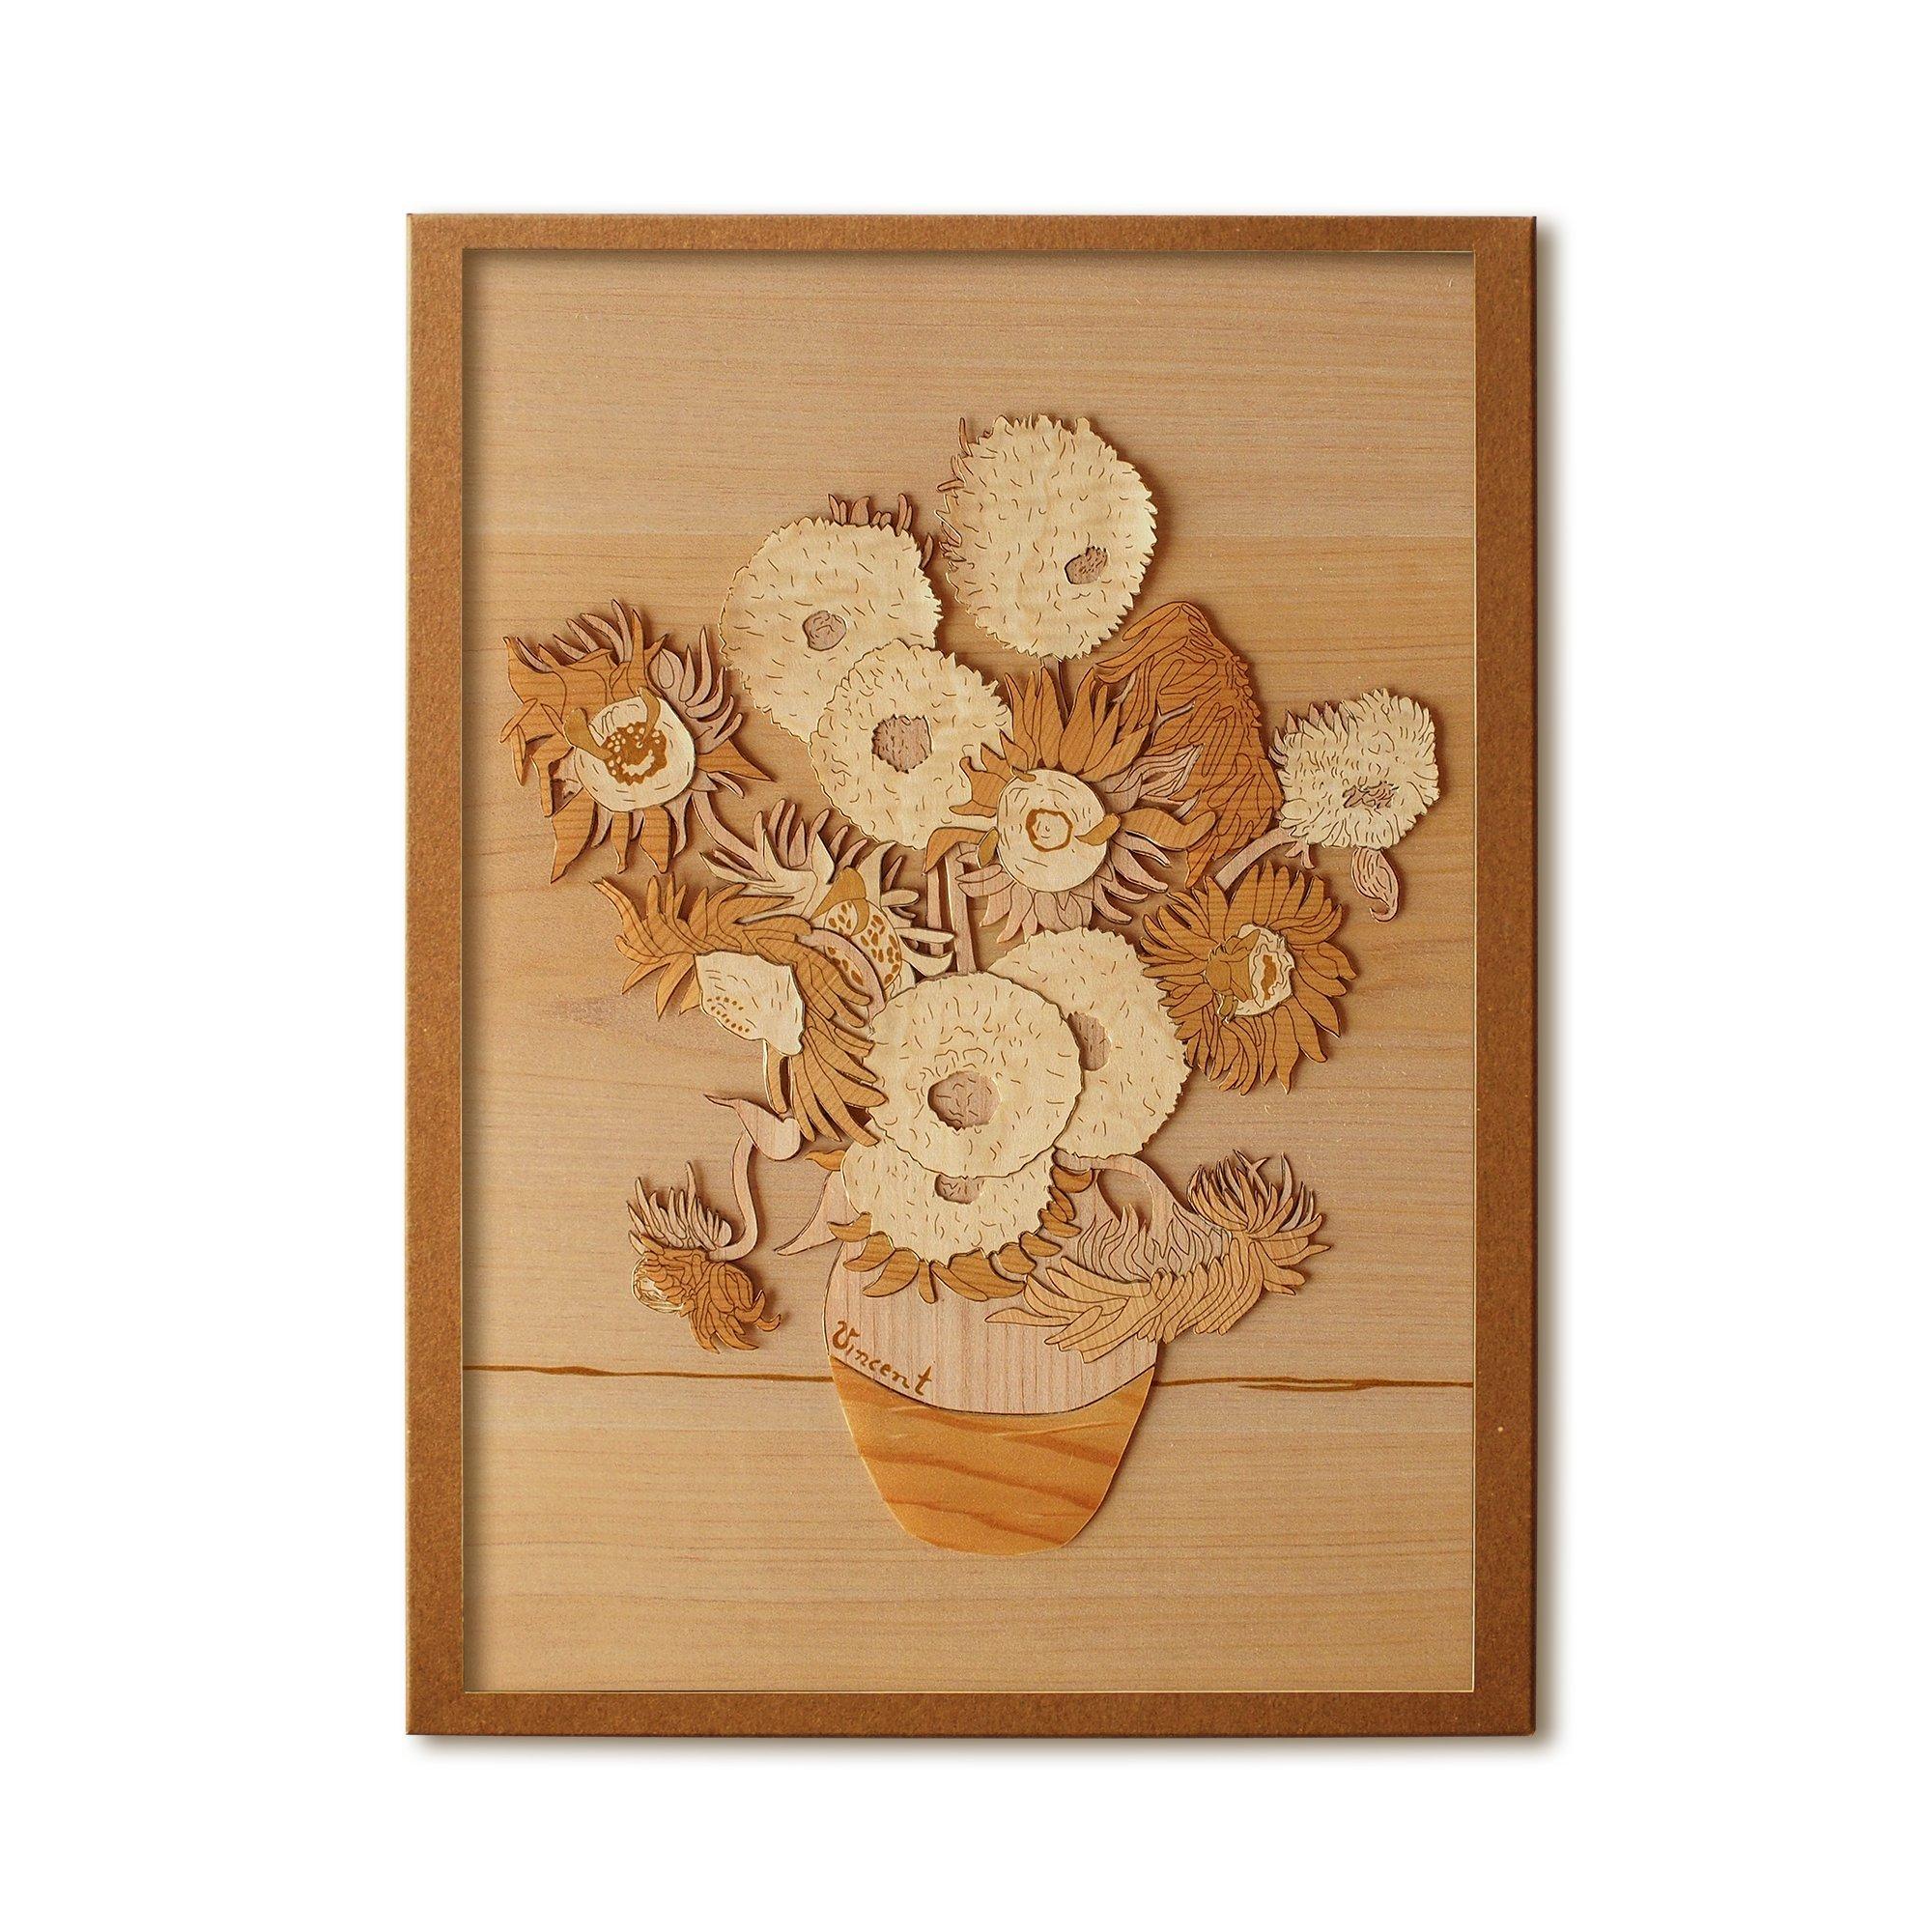 KINOWA Wooden Art Kit Kiharie Sunflowers Made in Japan by KINOWA (Image #1)